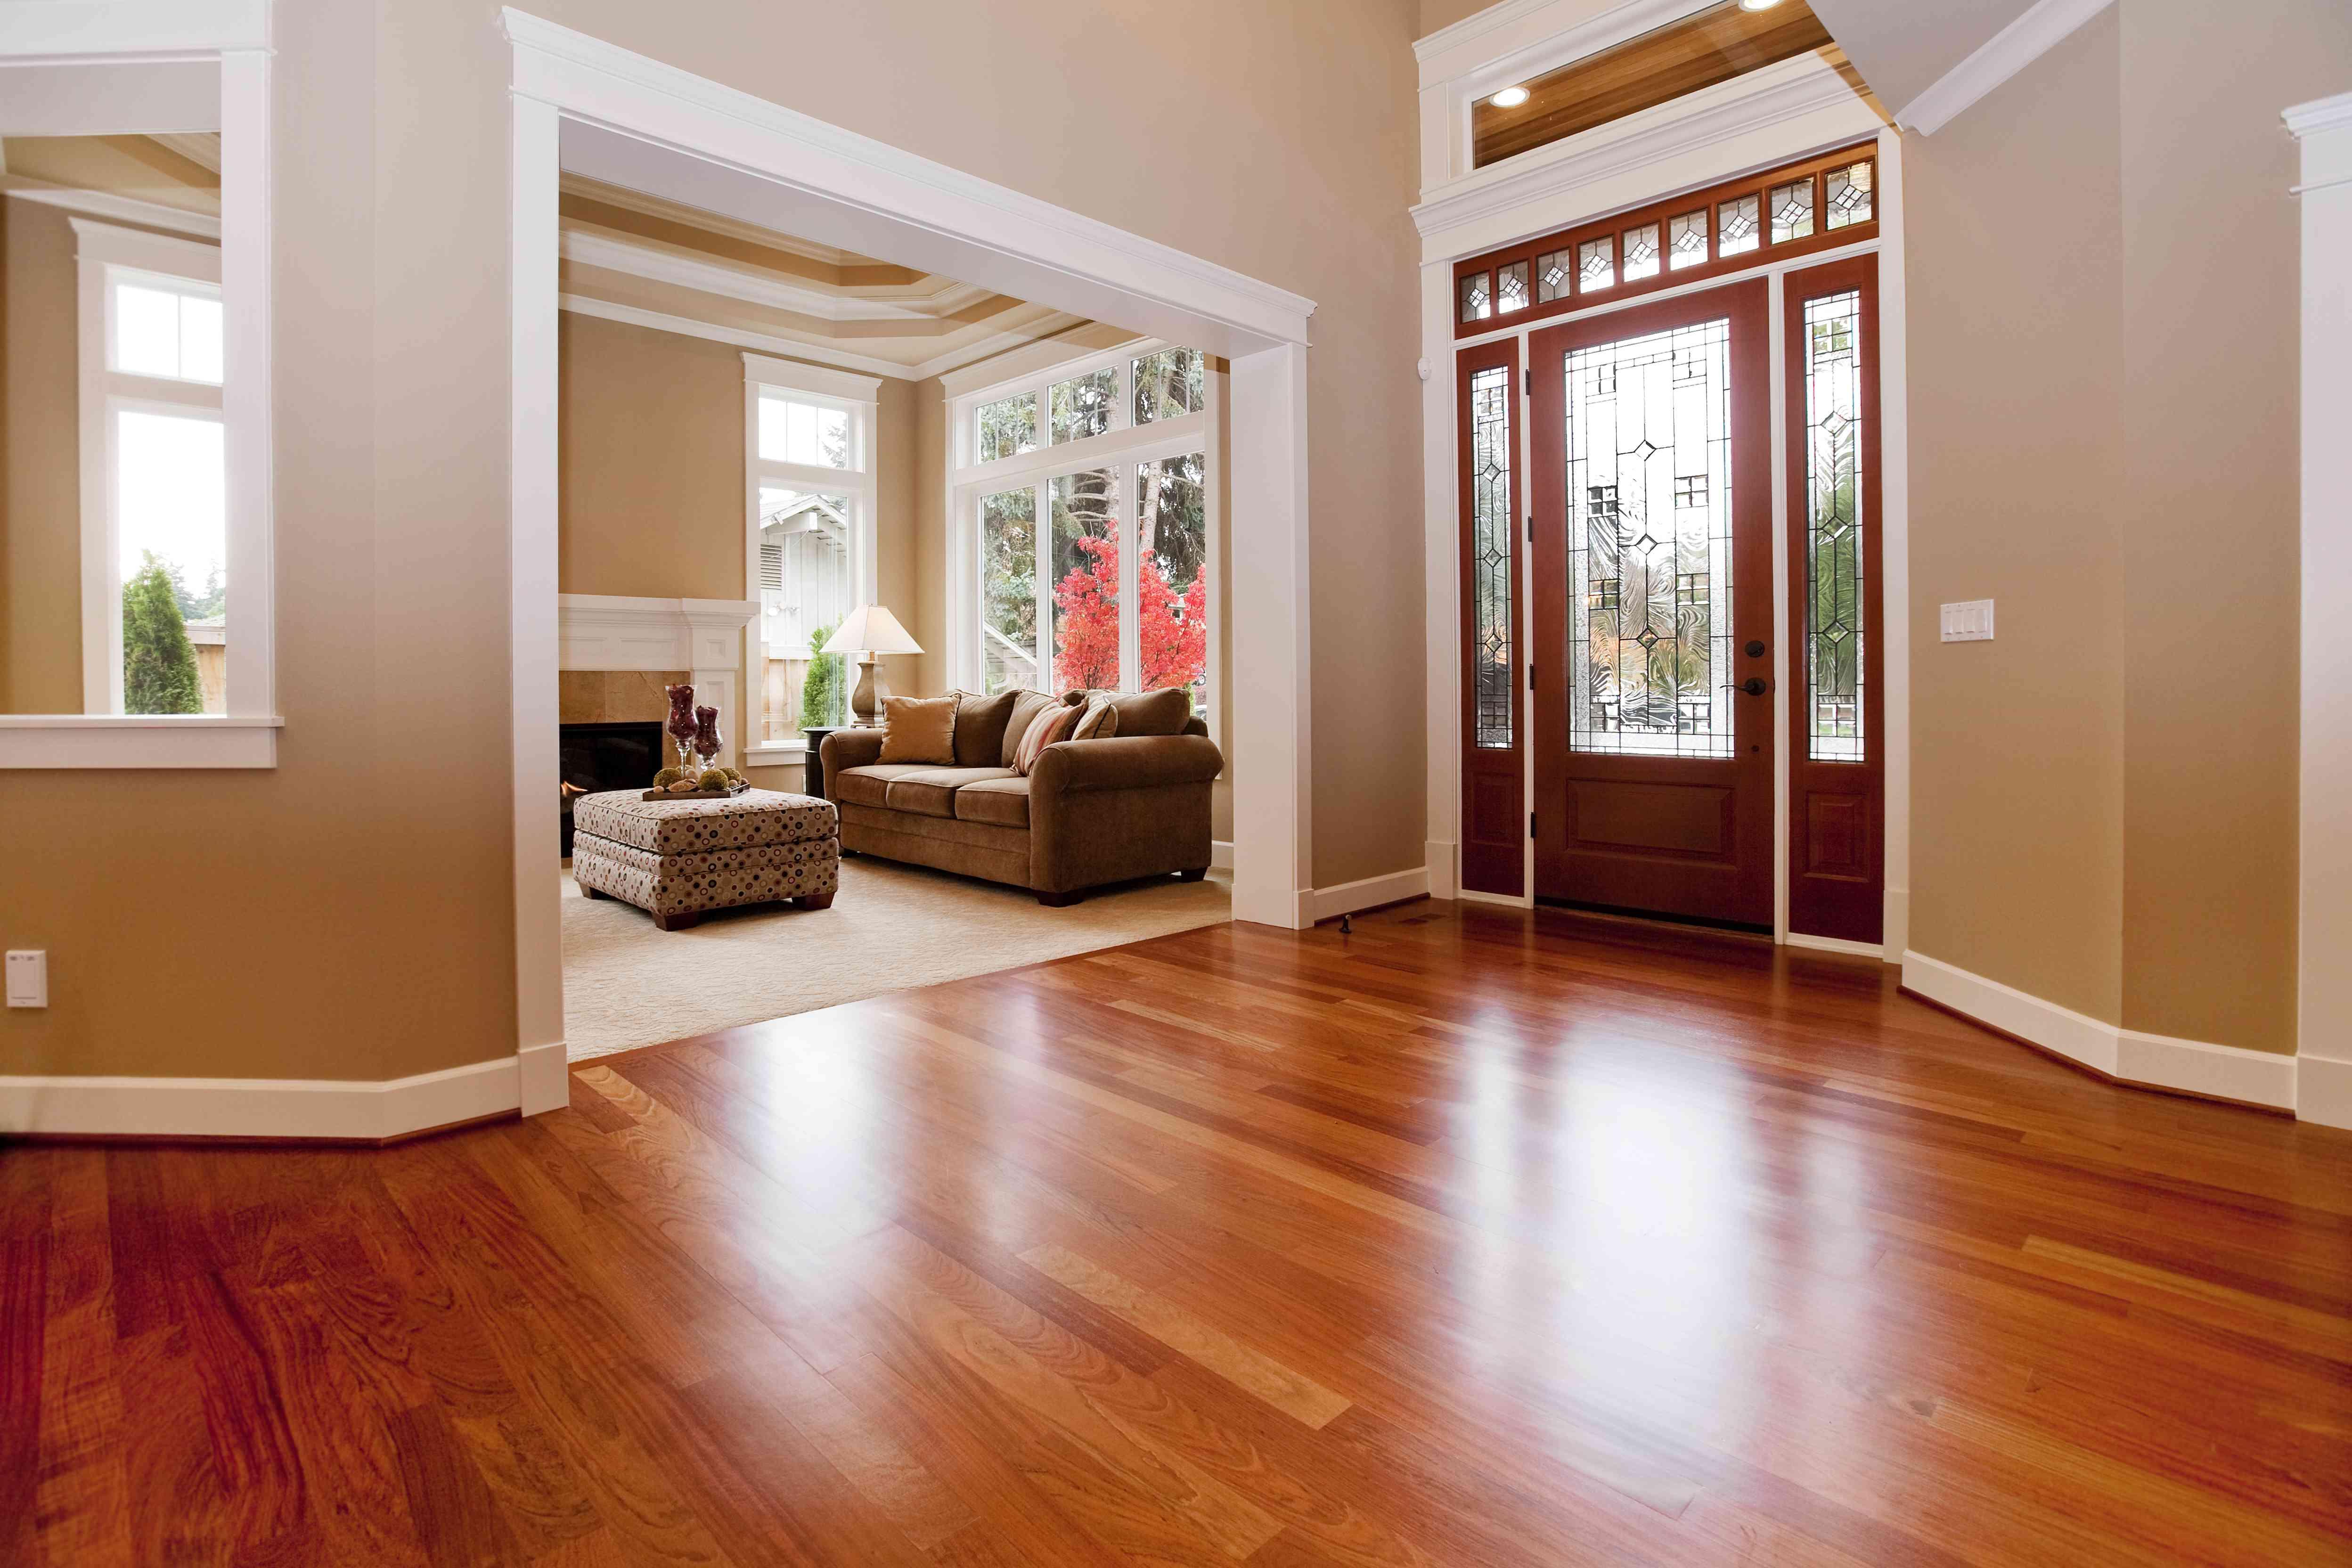 Beautiful New custom Entryway upscale home hardwood floors